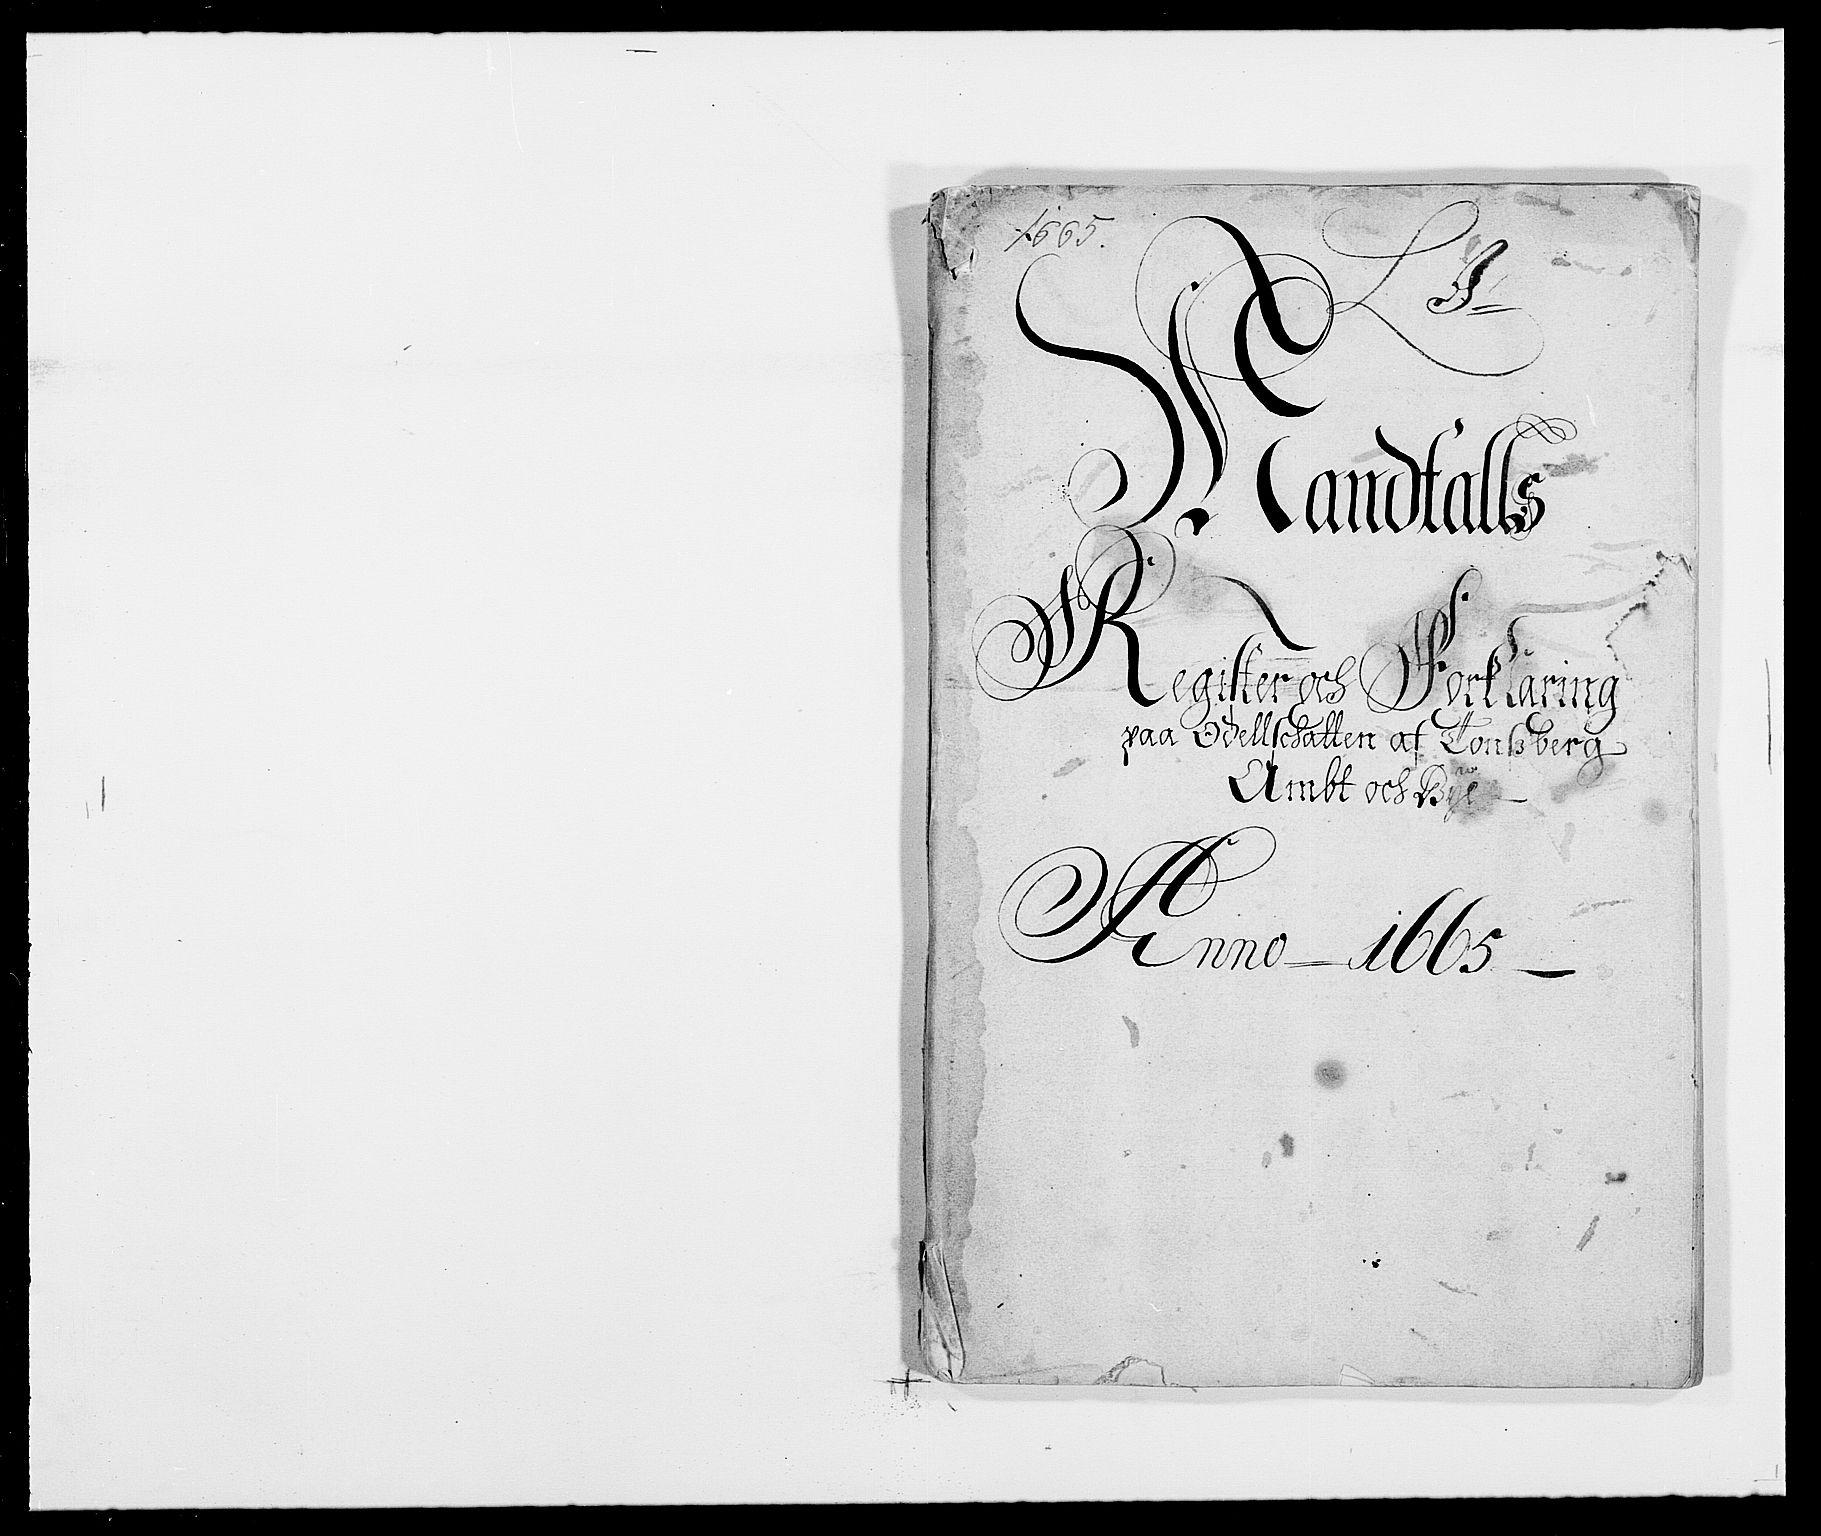 RA, Rentekammeret inntil 1814, Reviderte regnskaper, Fogderegnskap, R32/L1839: Fogderegnskap Jarlsberg grevskap, 1664-1673, s. 286